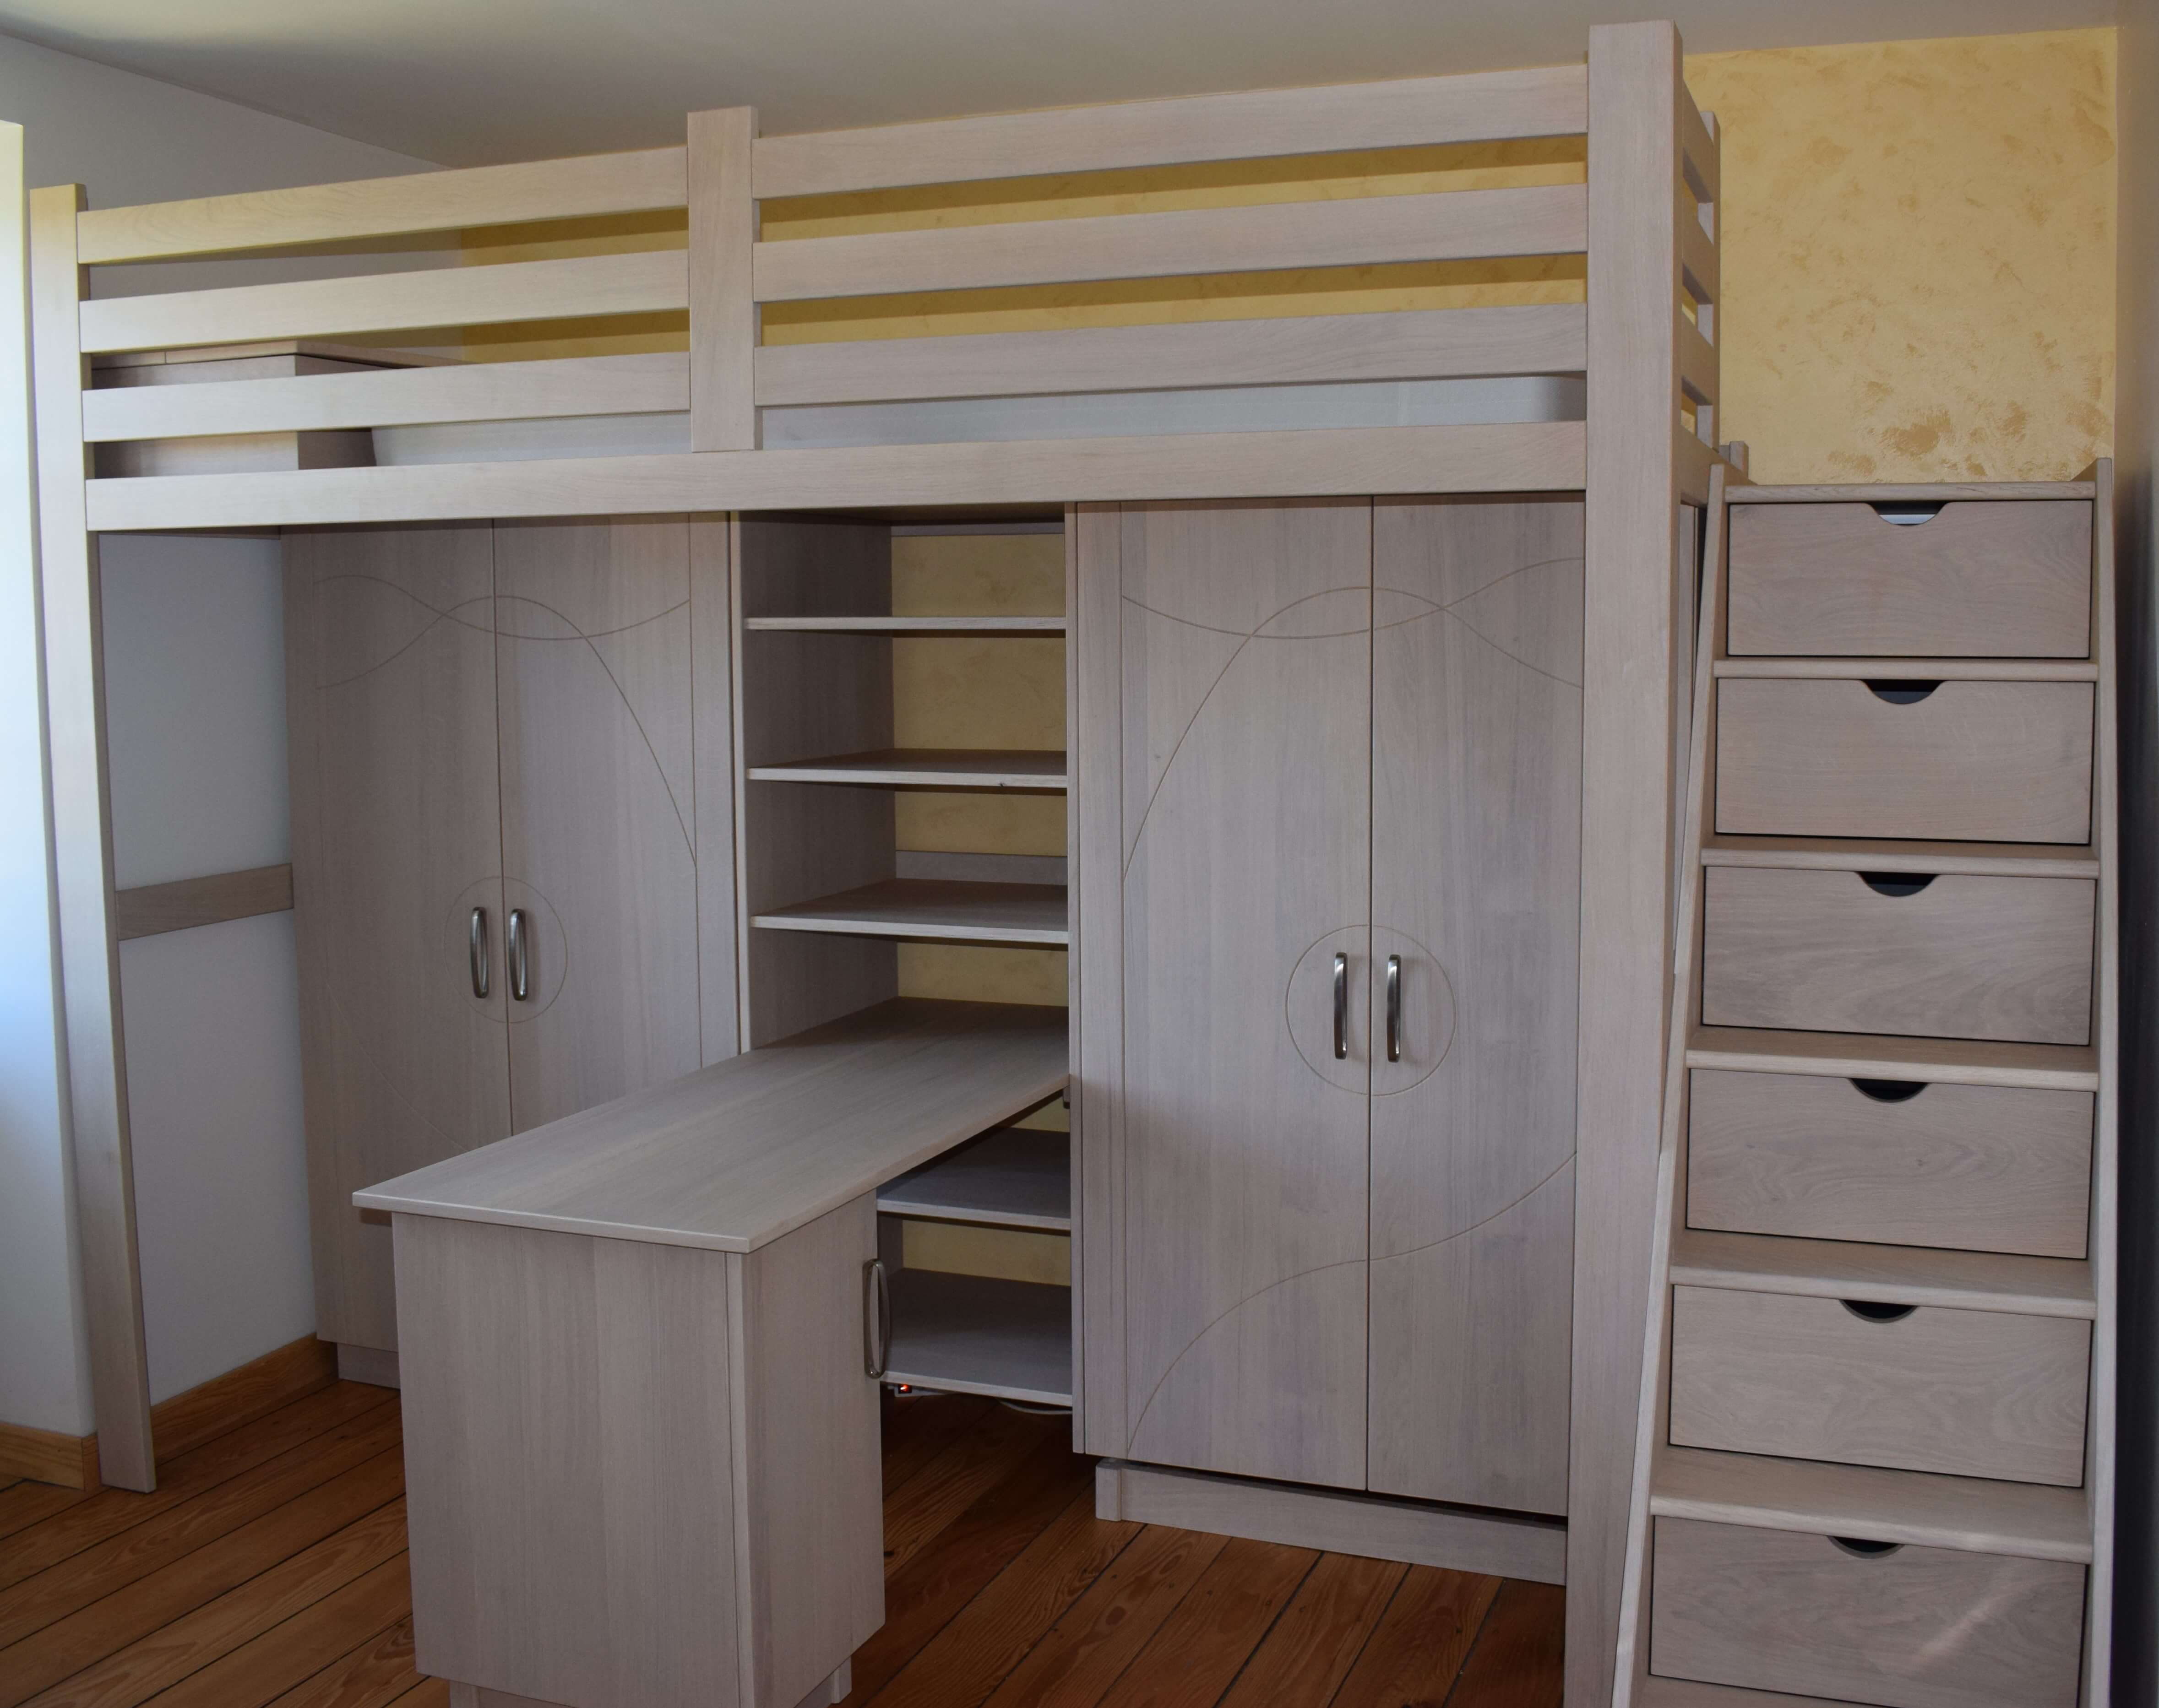 Menuiserie Figard - Fabrication sur mesure - Lit en mezzanine - Chêne - Vesoul